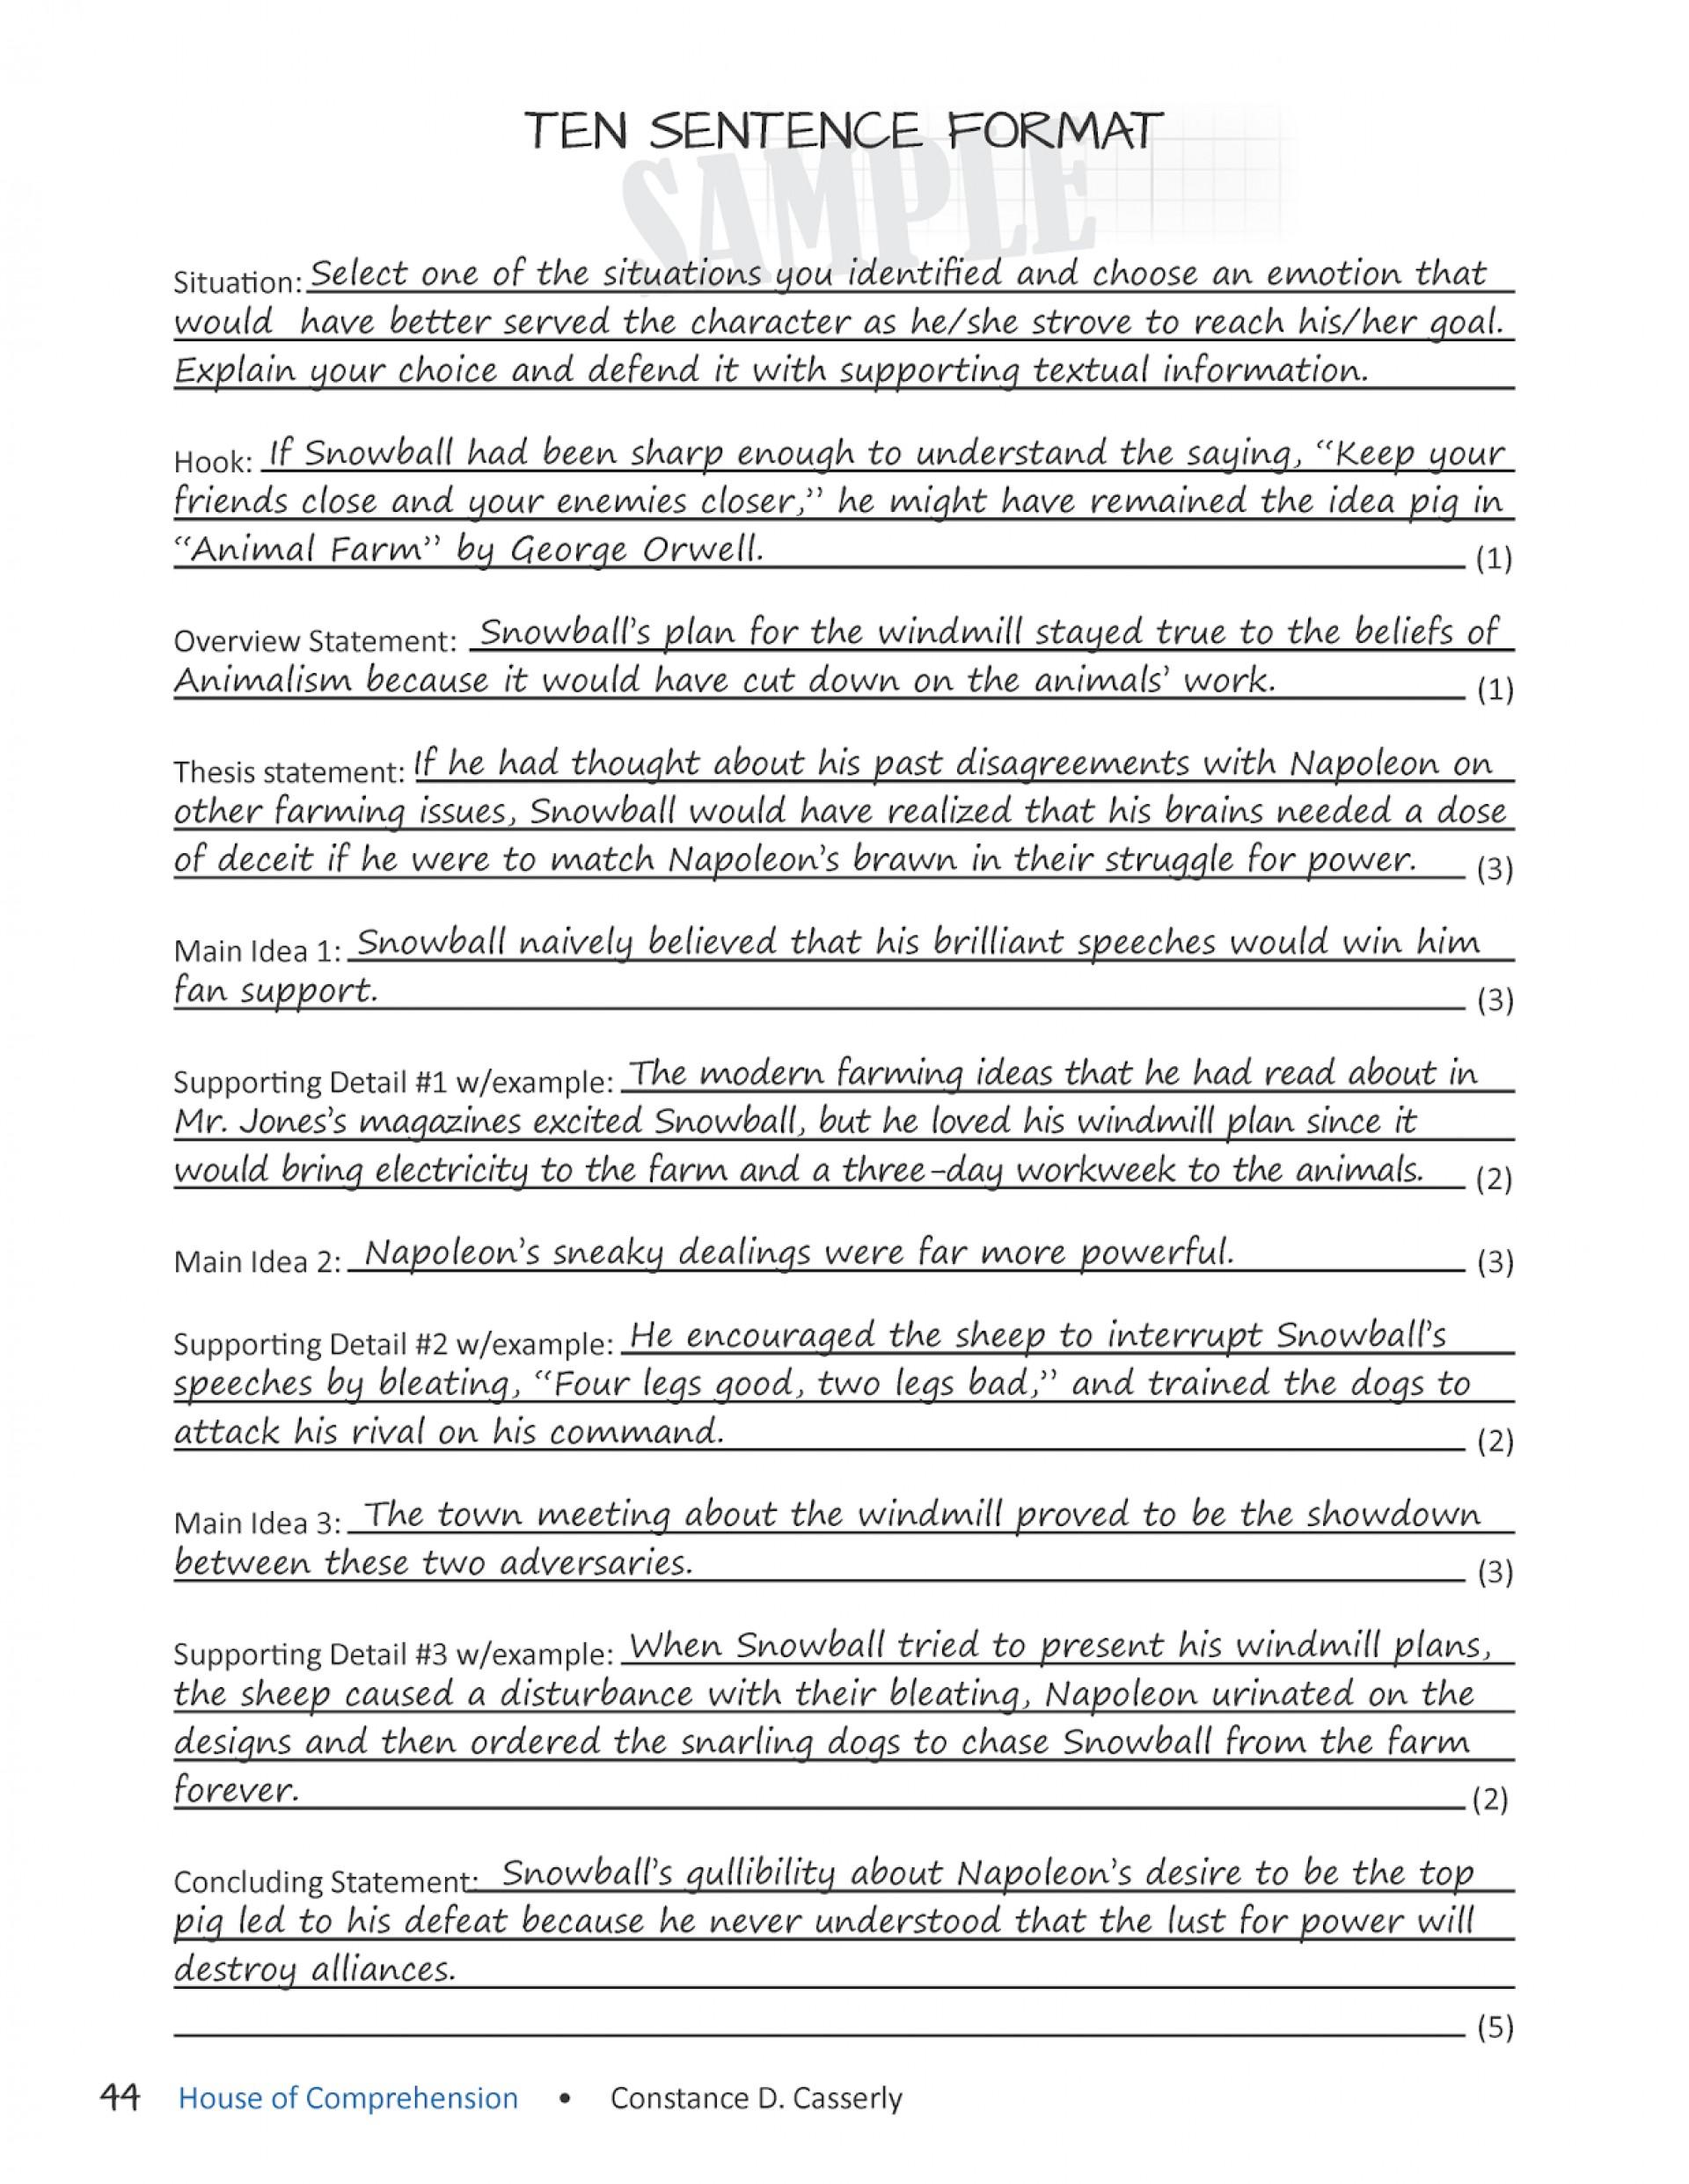 012 Languageartscomprehensionchecktensentenceformat25252b252525252812525252529 Page 5 Causal Argument Essay Topics Imposing Topic Ideas 1920